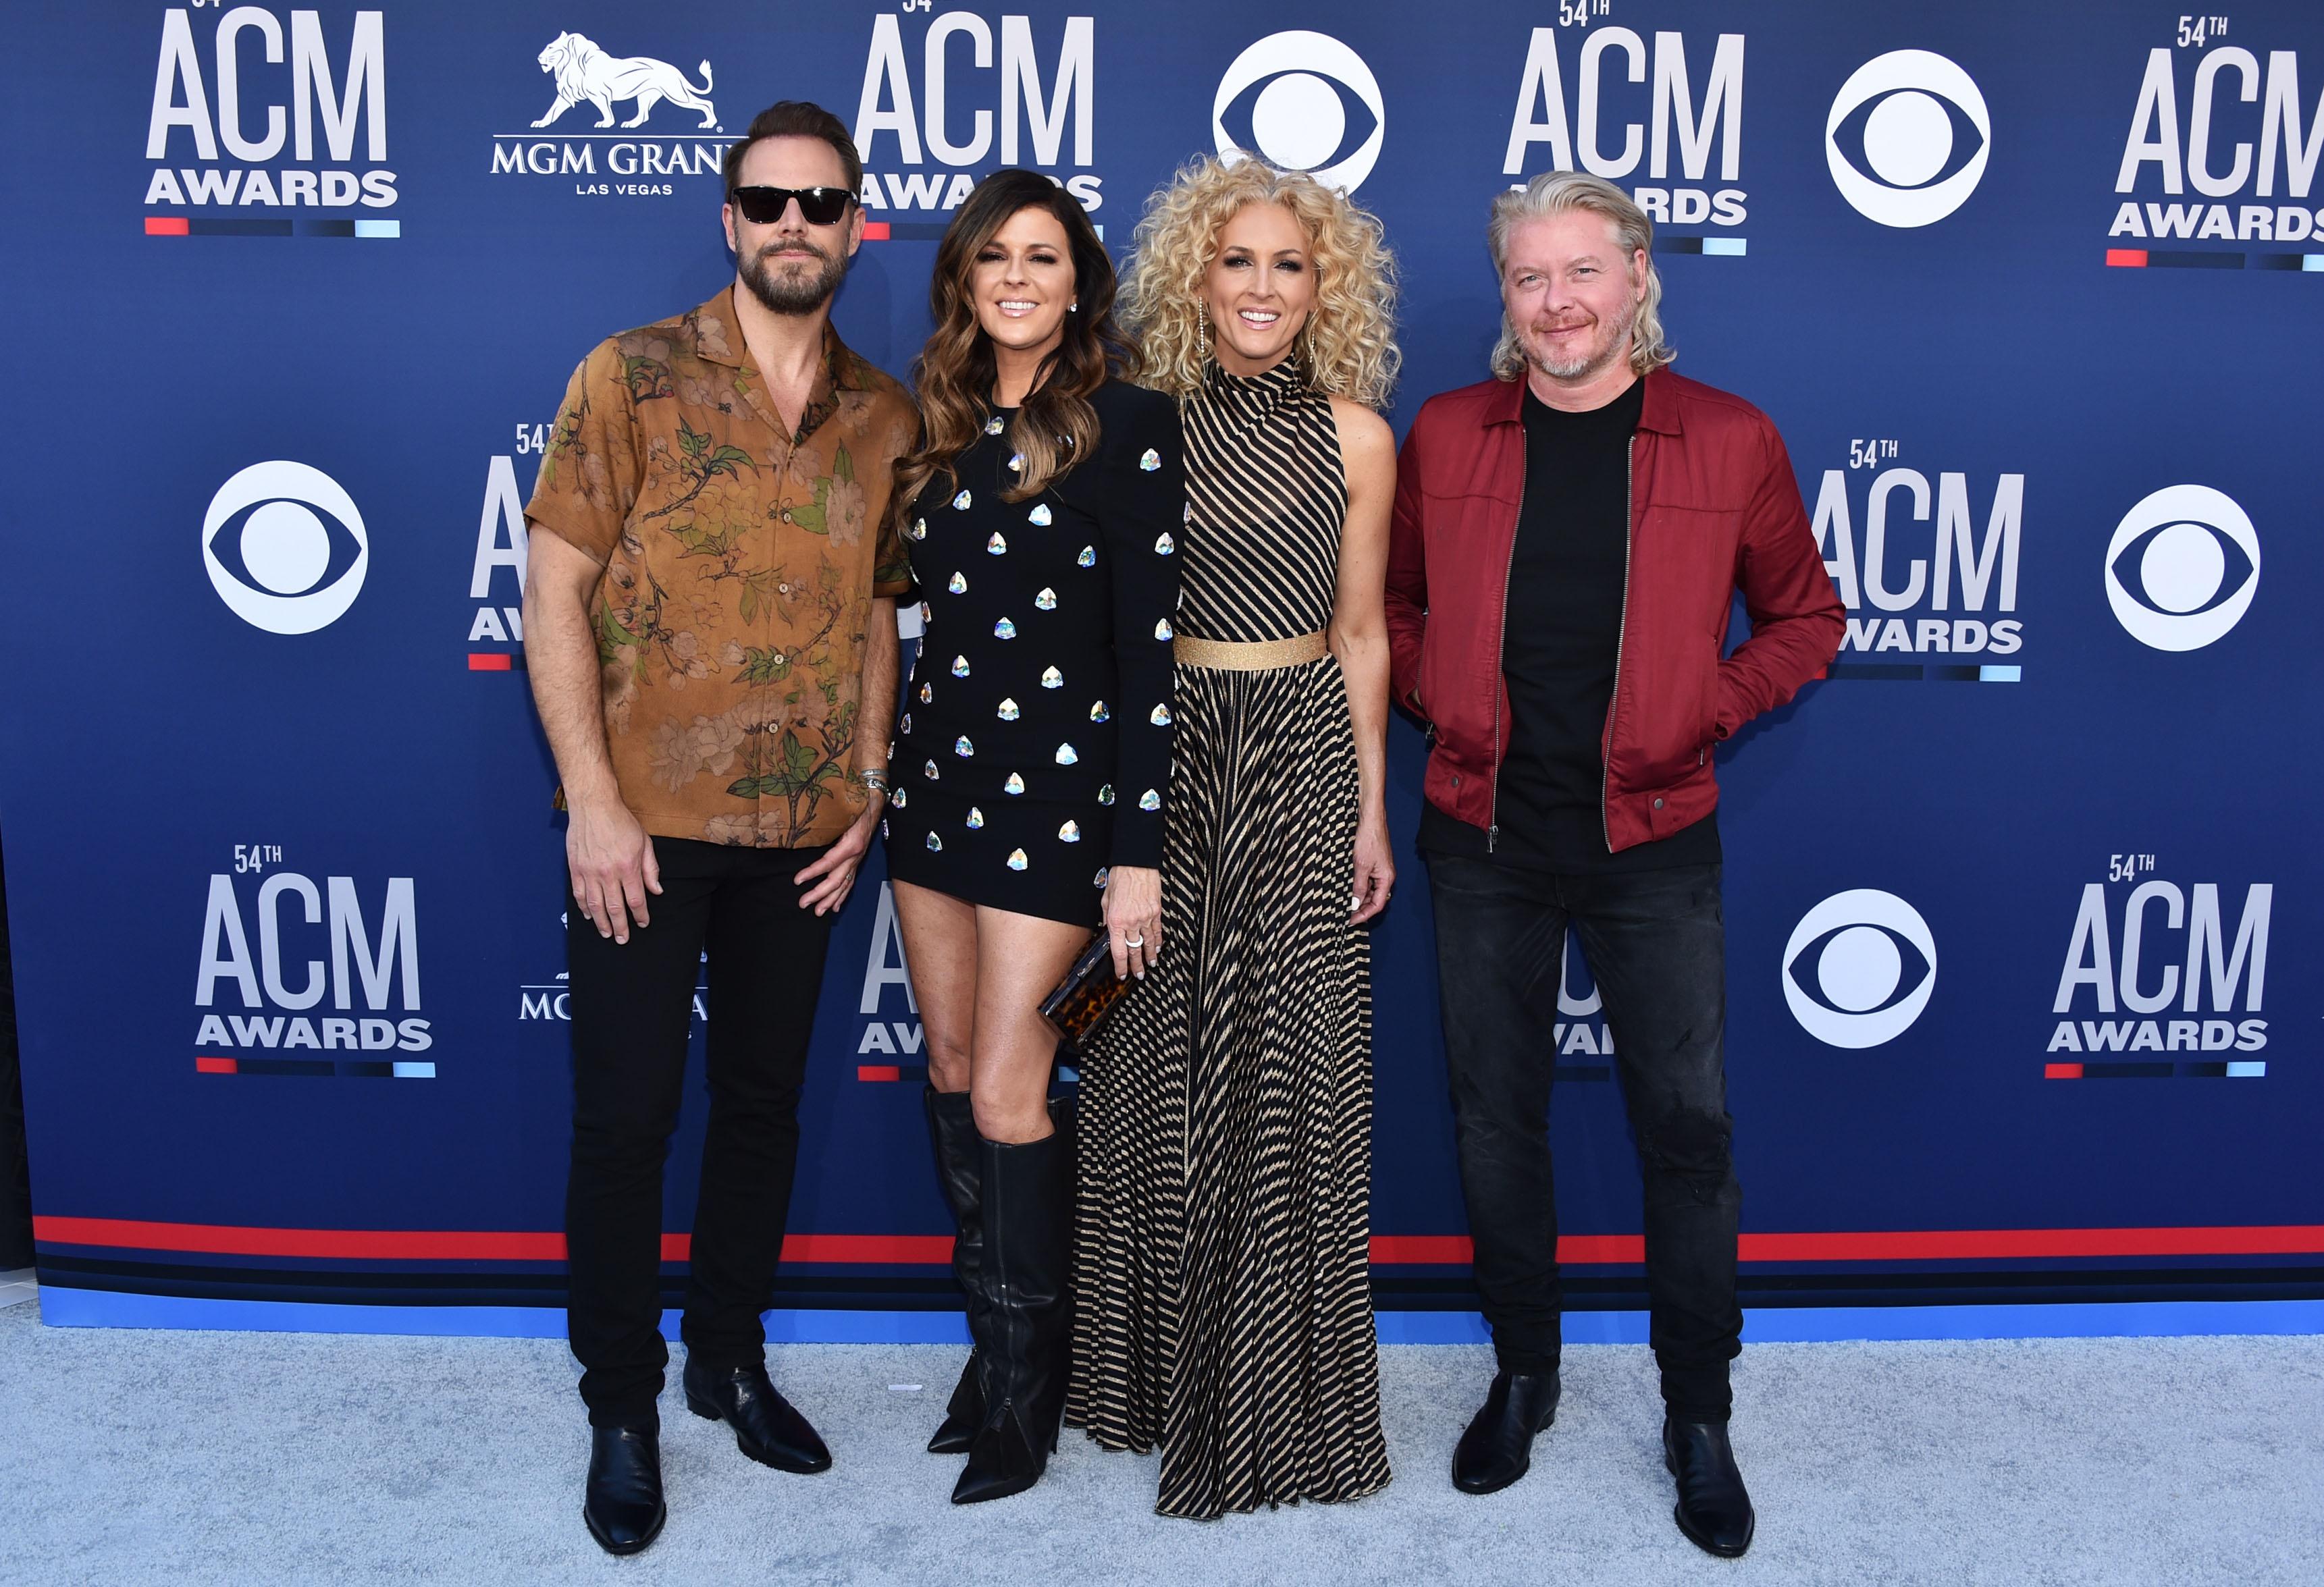 a647f389370 PHOTOS: 2019 ACM Awards Red Carpet Gallery Sounds Like Nashville